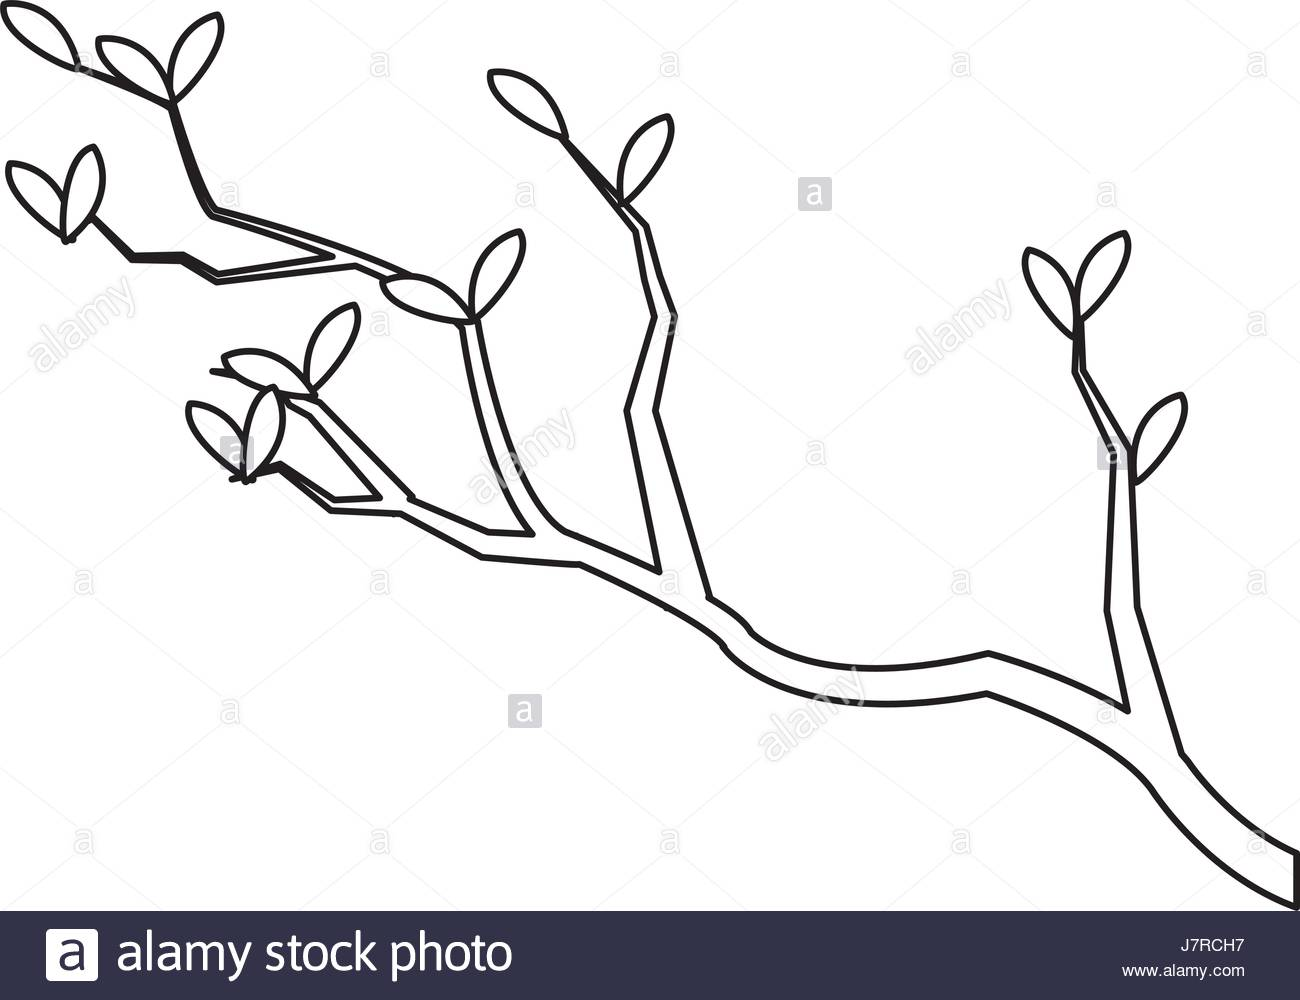 1300x1000 Outline Branch Leaves Tree Nature Japan Stock Vector Art